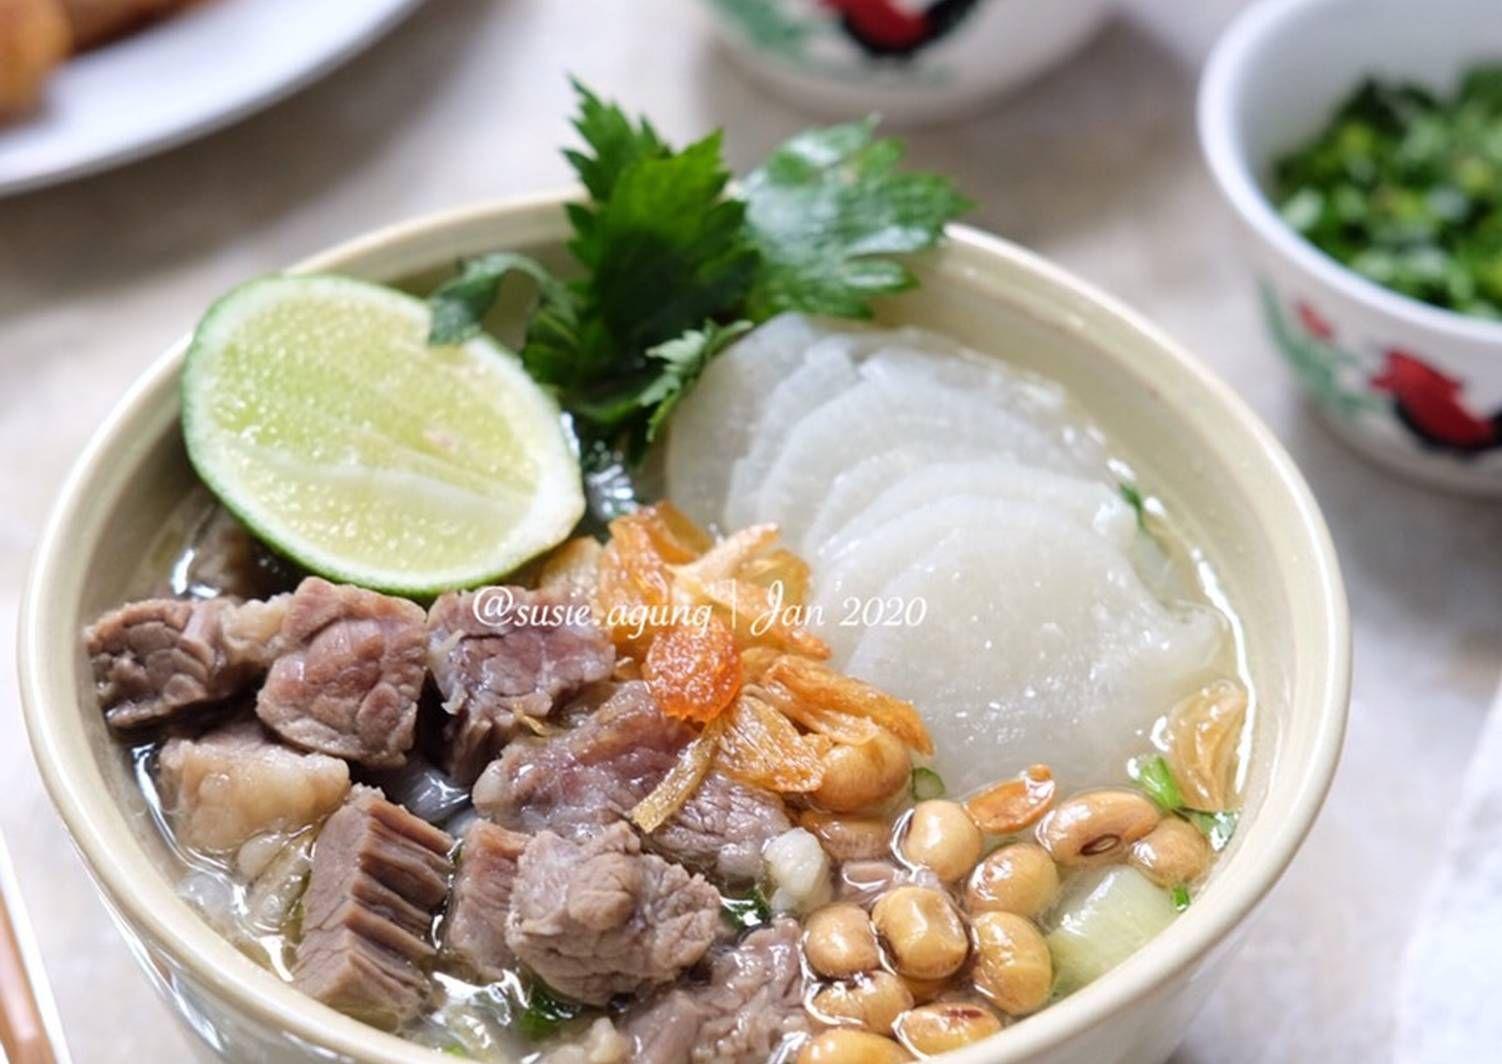 Resep Soto Bandung Oleh Susi Agung Resep Resep Resep Makanan Sehat Resep Sup